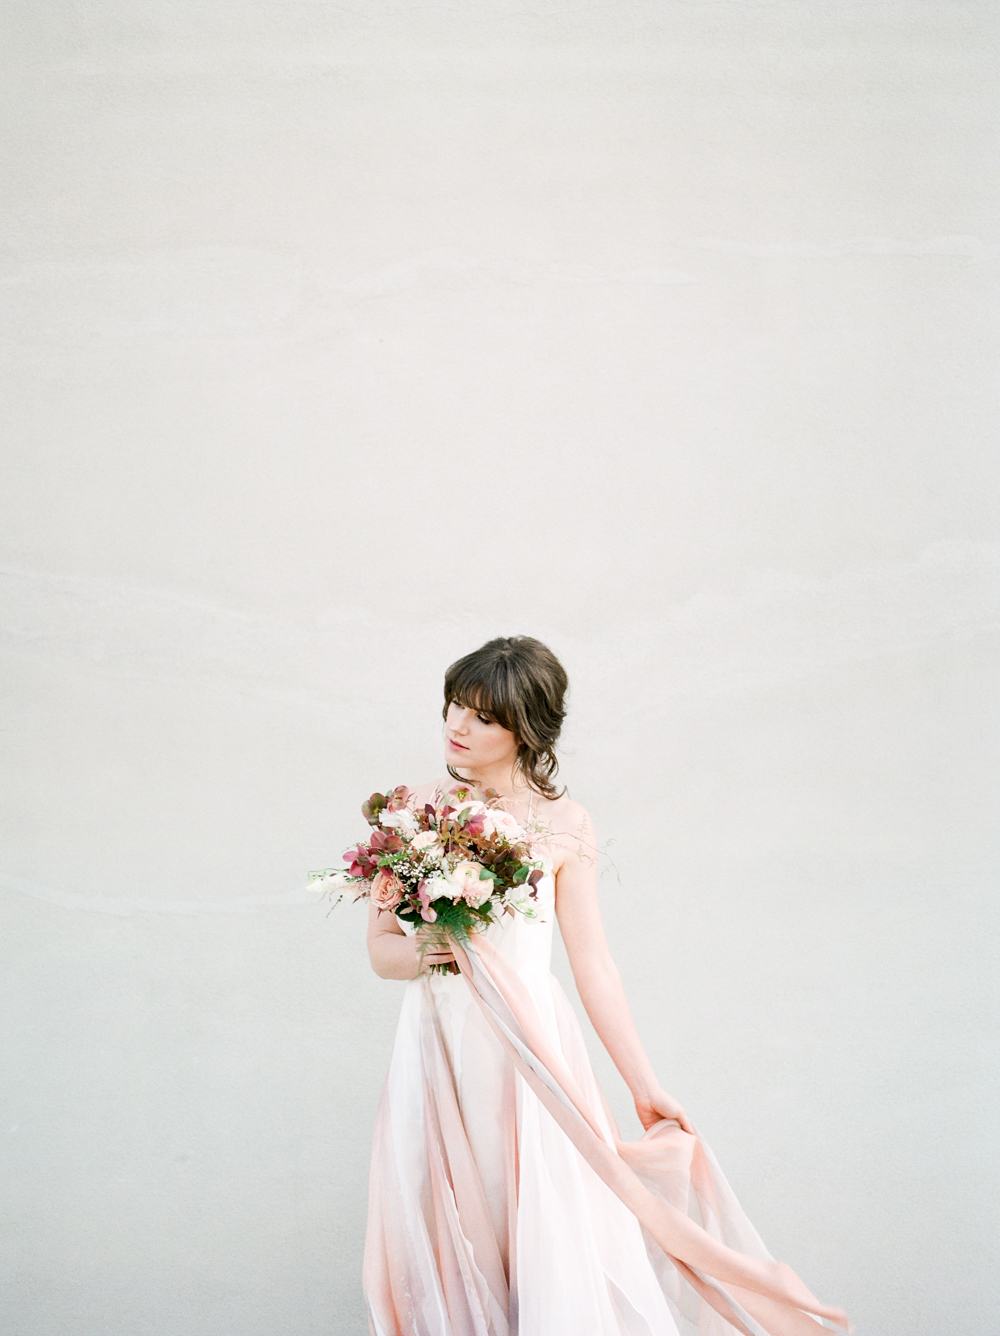 A lovely houston bride_wedding_Christine Gosch_www.christinegosch.com_Houston, TX-8.jpg